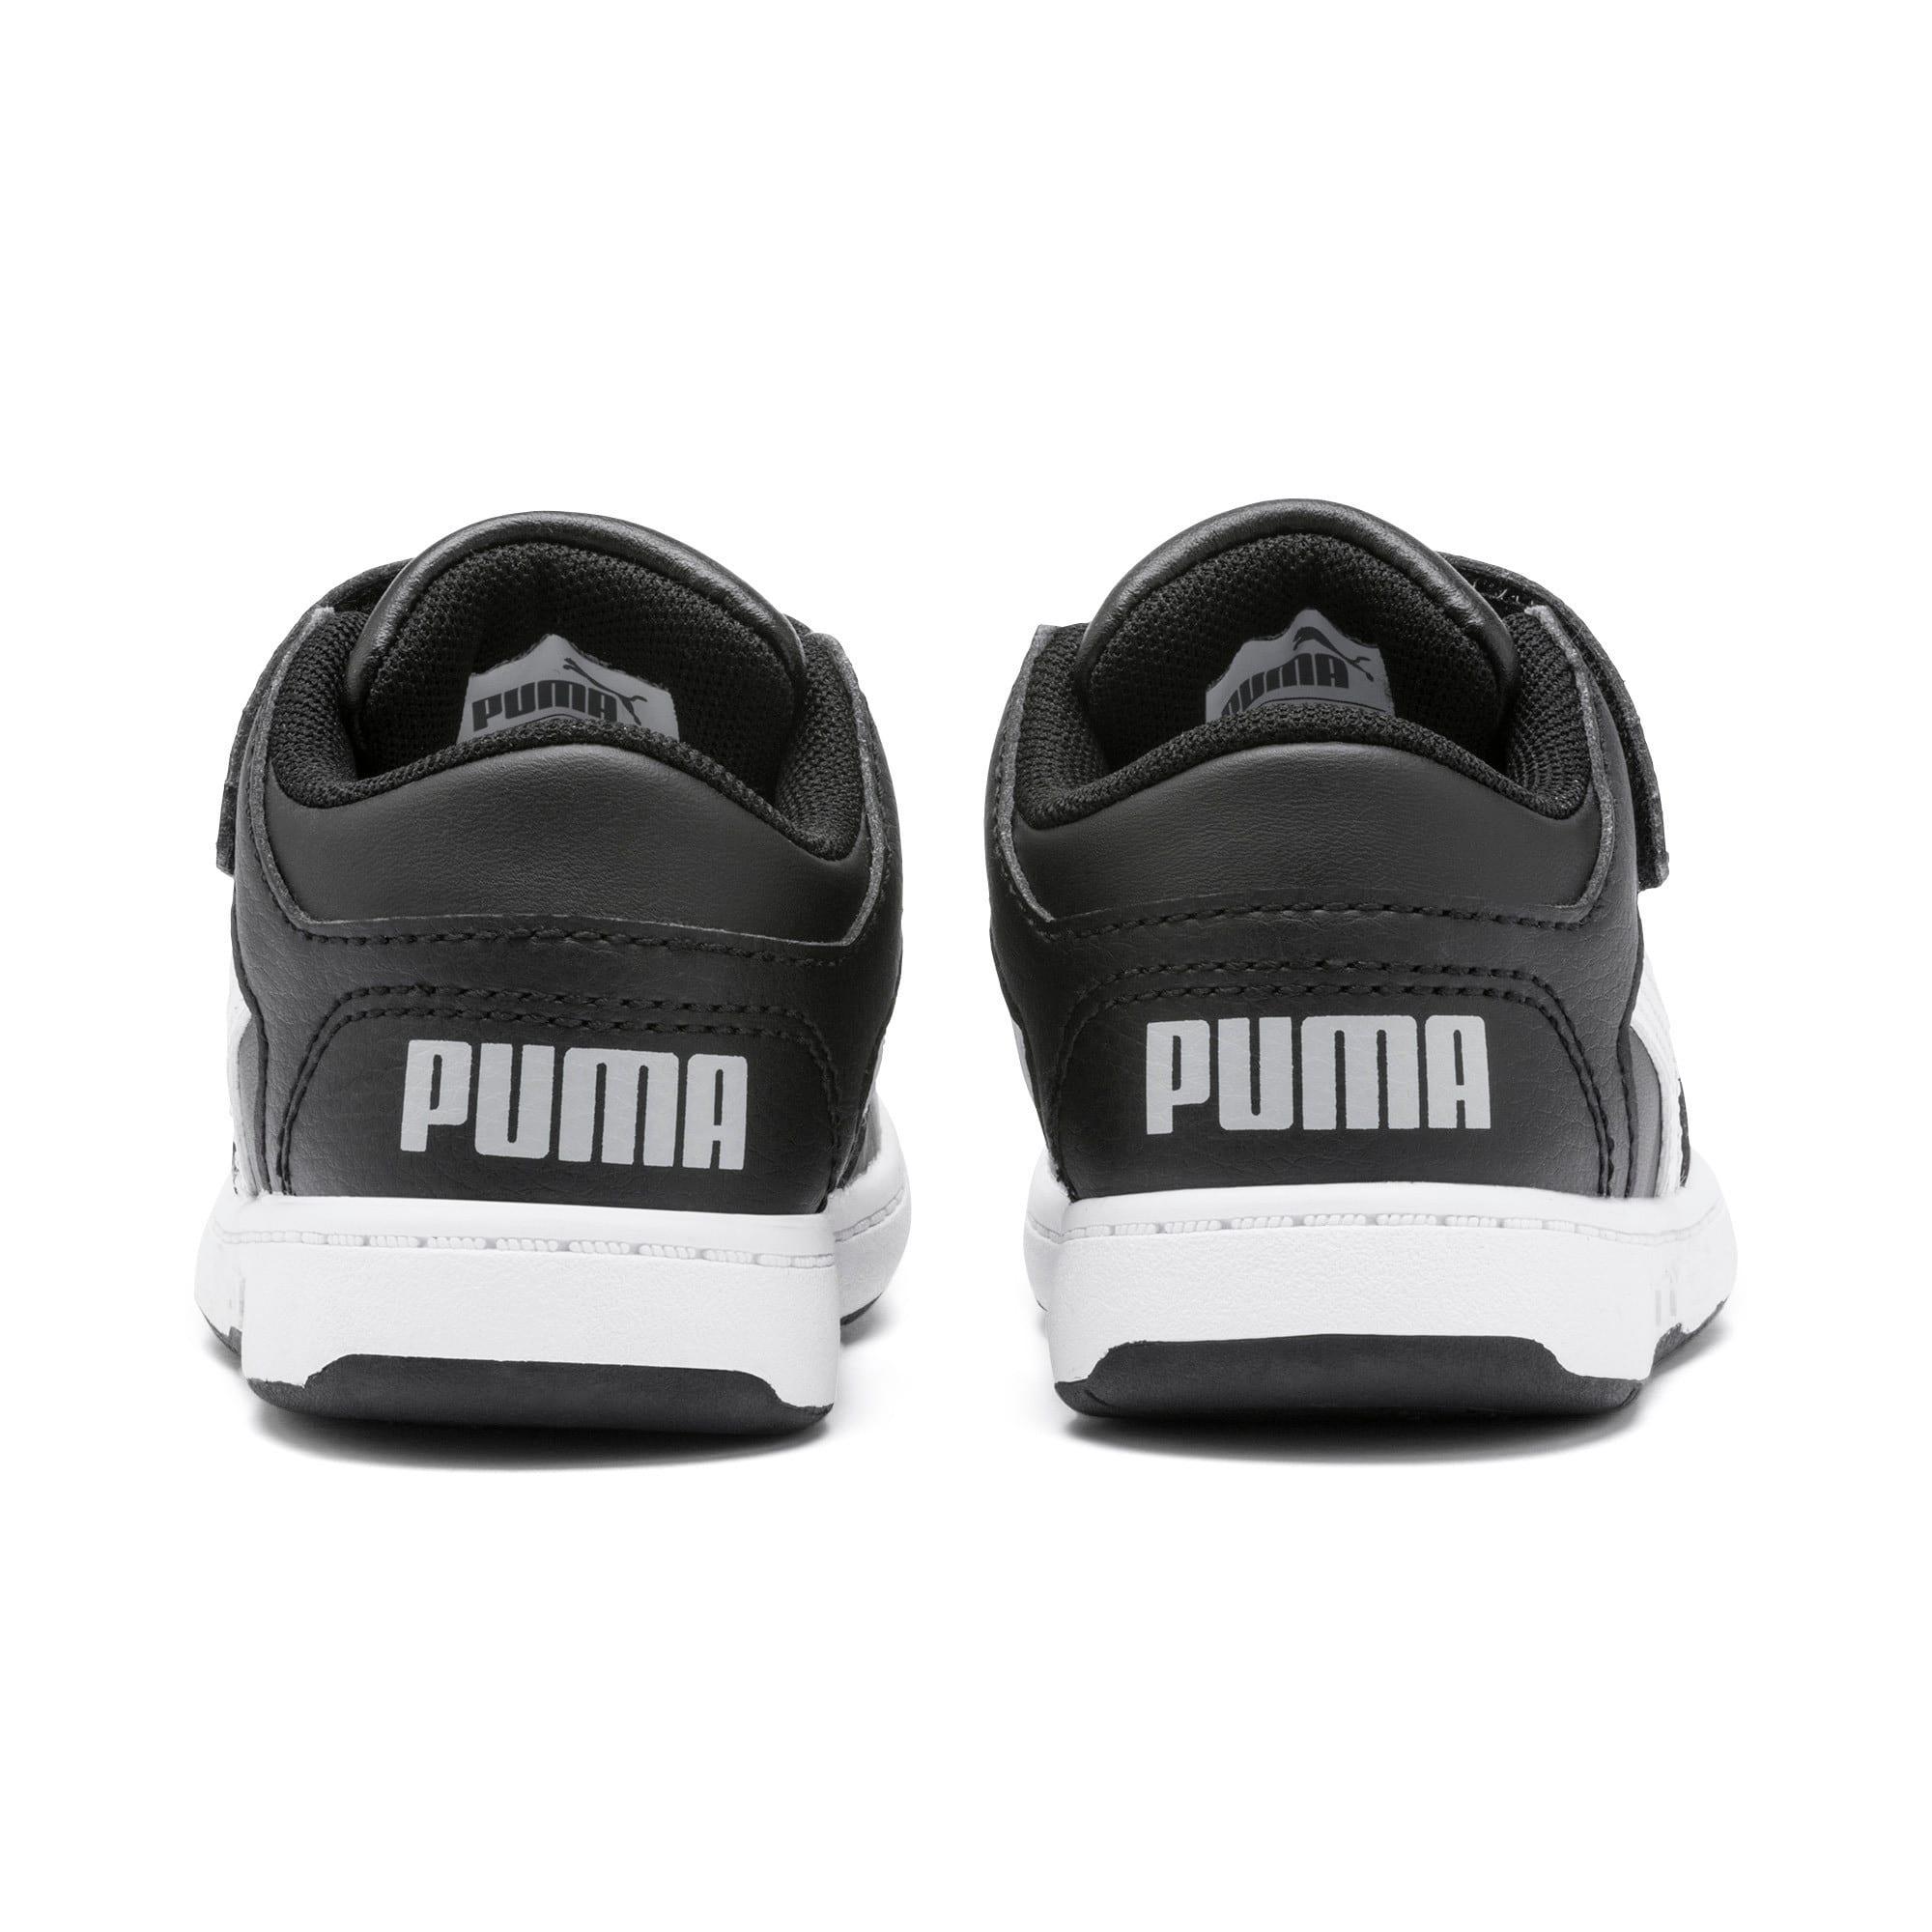 Miniatura 3 de Zapatos deportivos PUMA Rebound LayUp Lo para INF, Puma Black-Blanco-High Rise, mediano